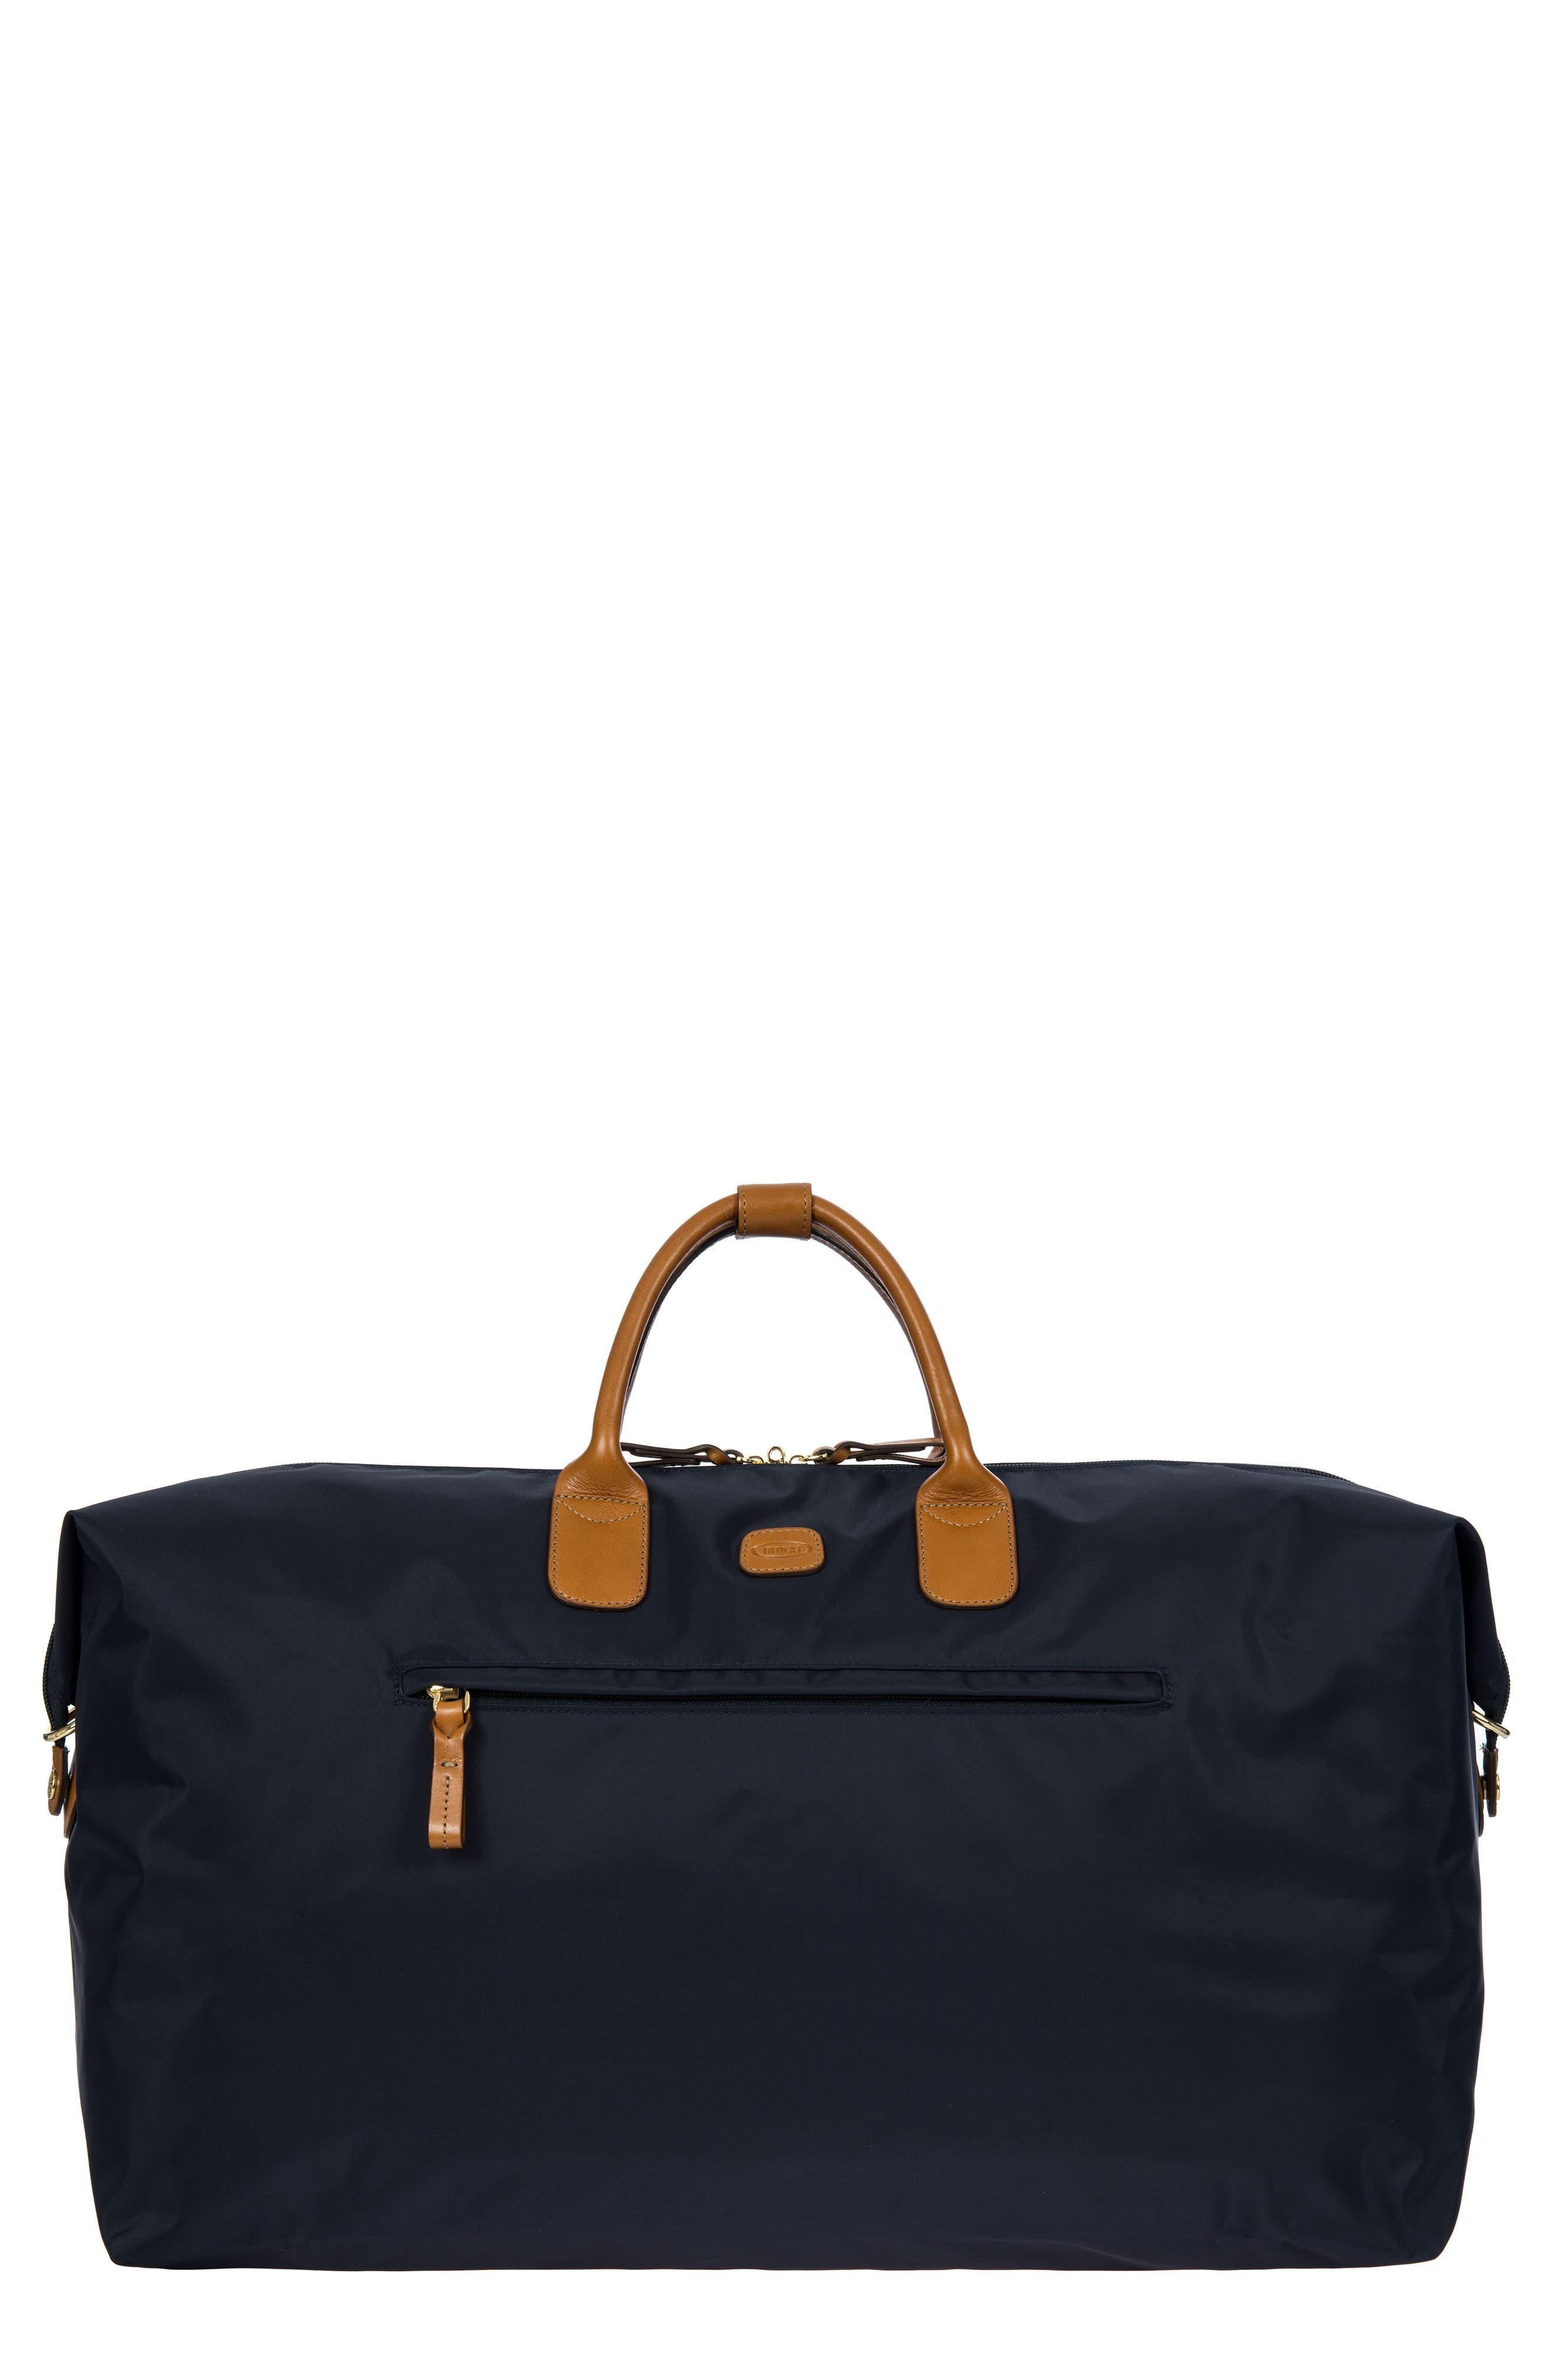 X-Bag Boarding 22-Inch Duffel Bag,                         Main,                         color, NAVY